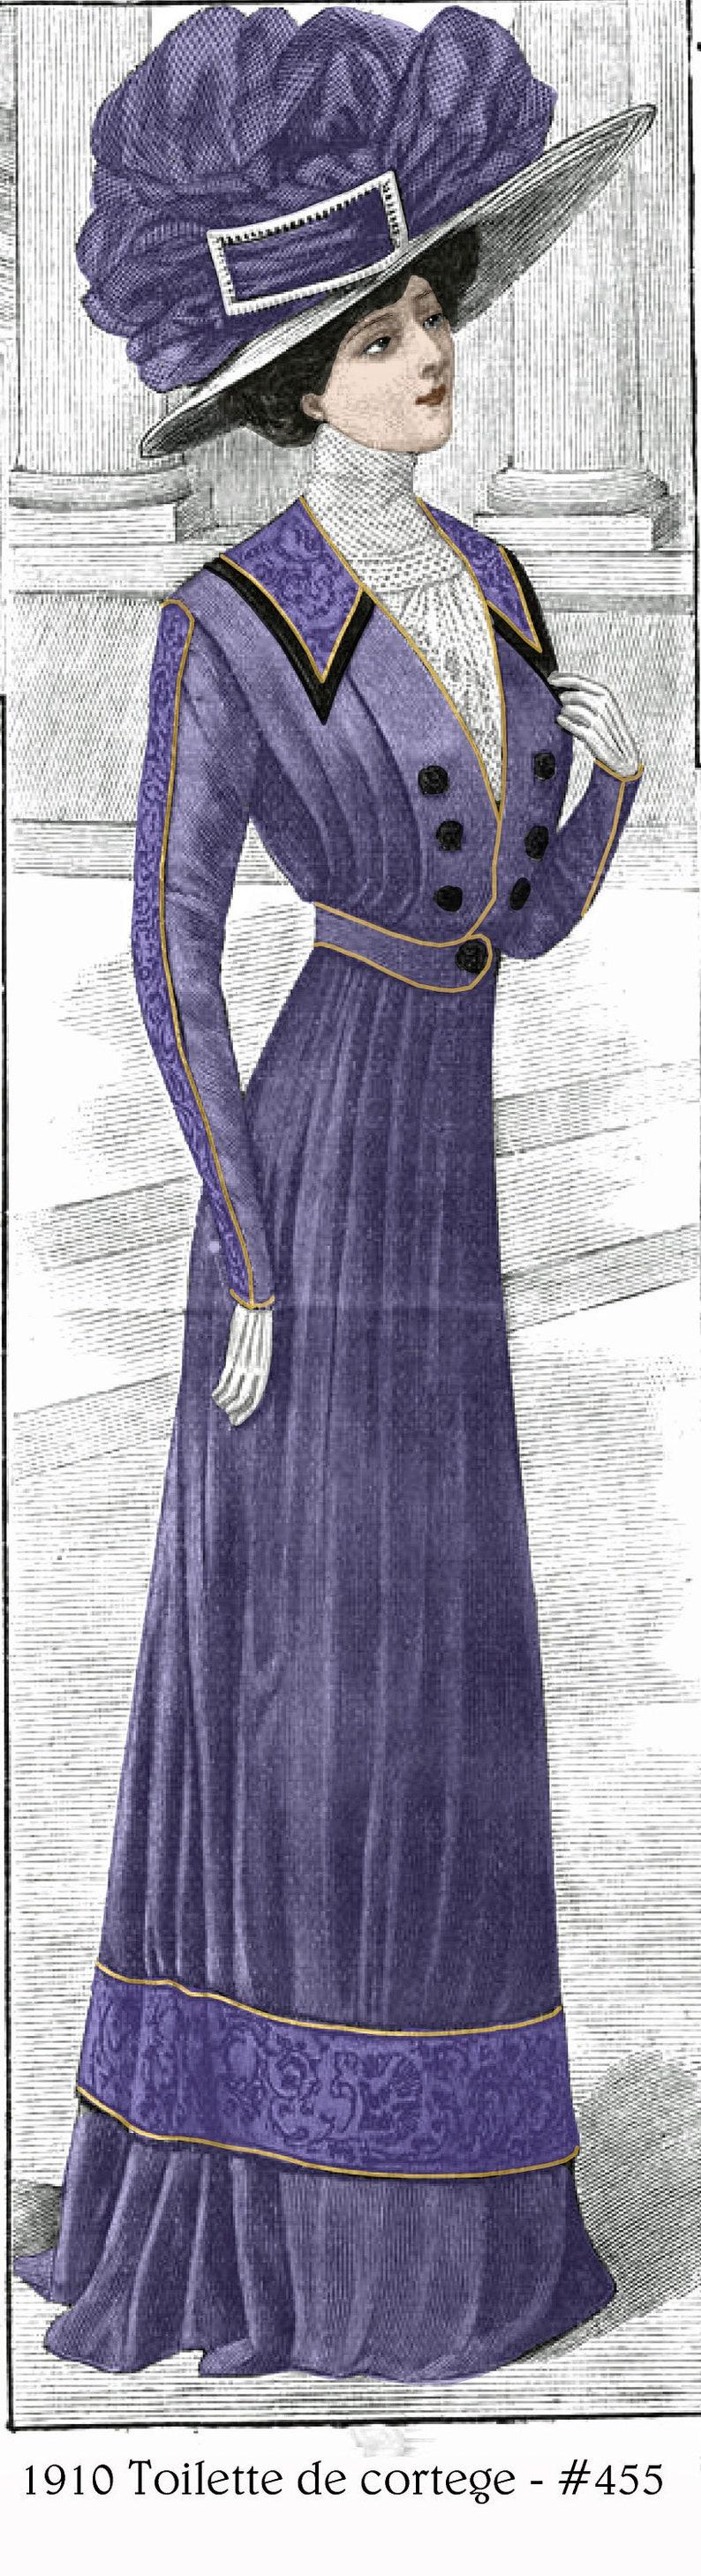 Edwardian Sewing Patterns- Dresses, Skirts, Blouses, Costumes 1910 Downton/Titanic Toilette de Cortege pattern - sized for you from antique original - includes bonus lingerie accessories library - 455 $9.95 AT vintagedancer.com